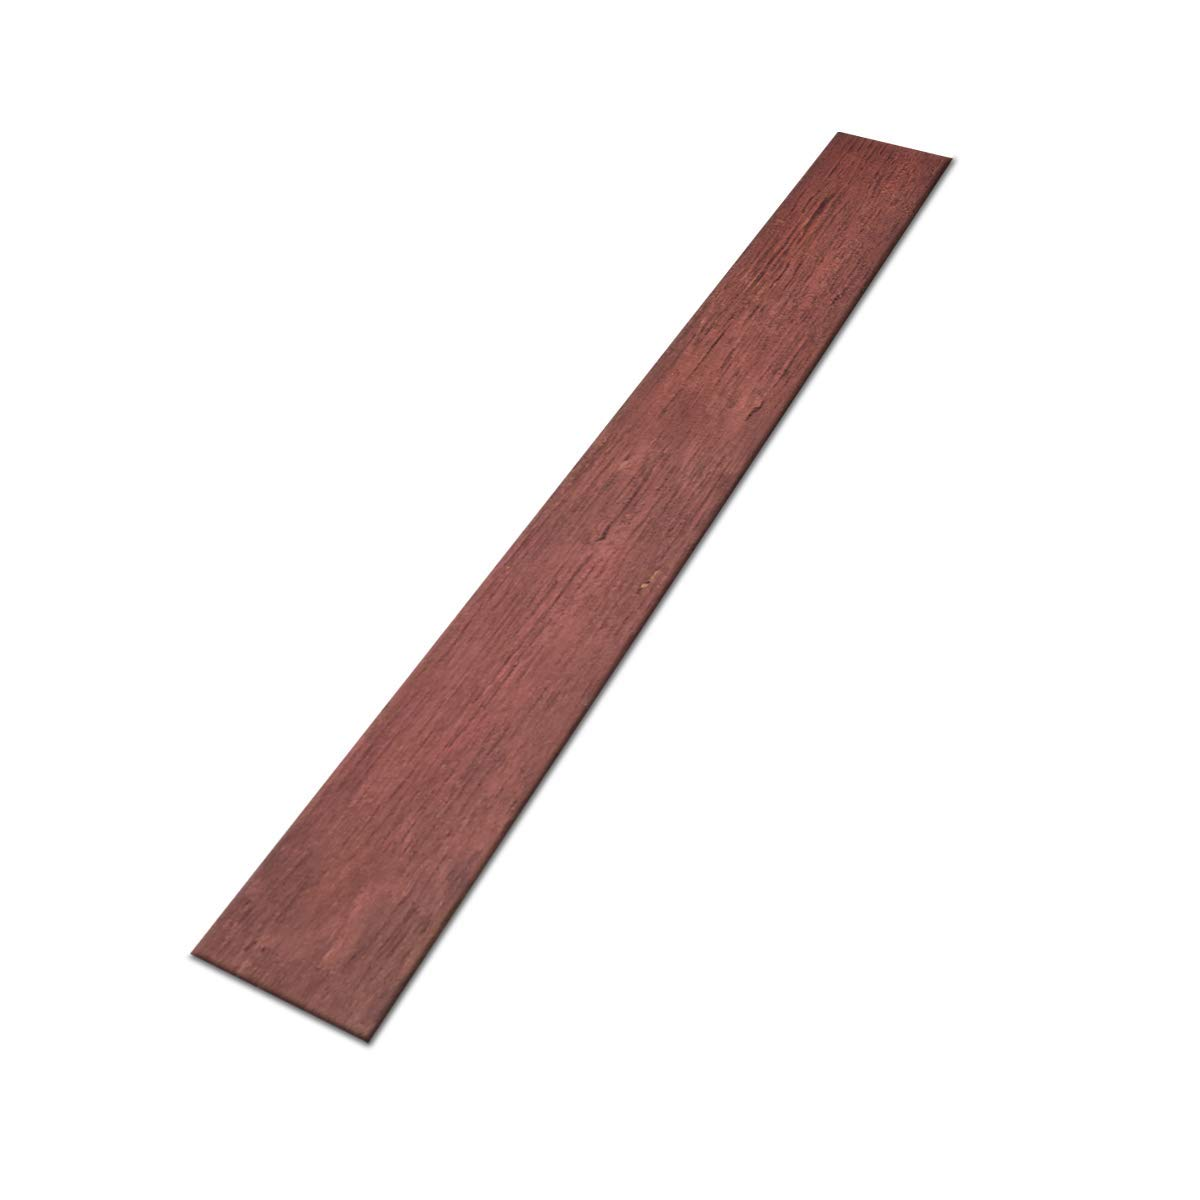 DW-D Reclaimed Barn Wood for Wall Decor 36x5 20sqft, 5.99//sqft MagicWood by Urban Decor Easy Installation Reddish Brown, 36x5